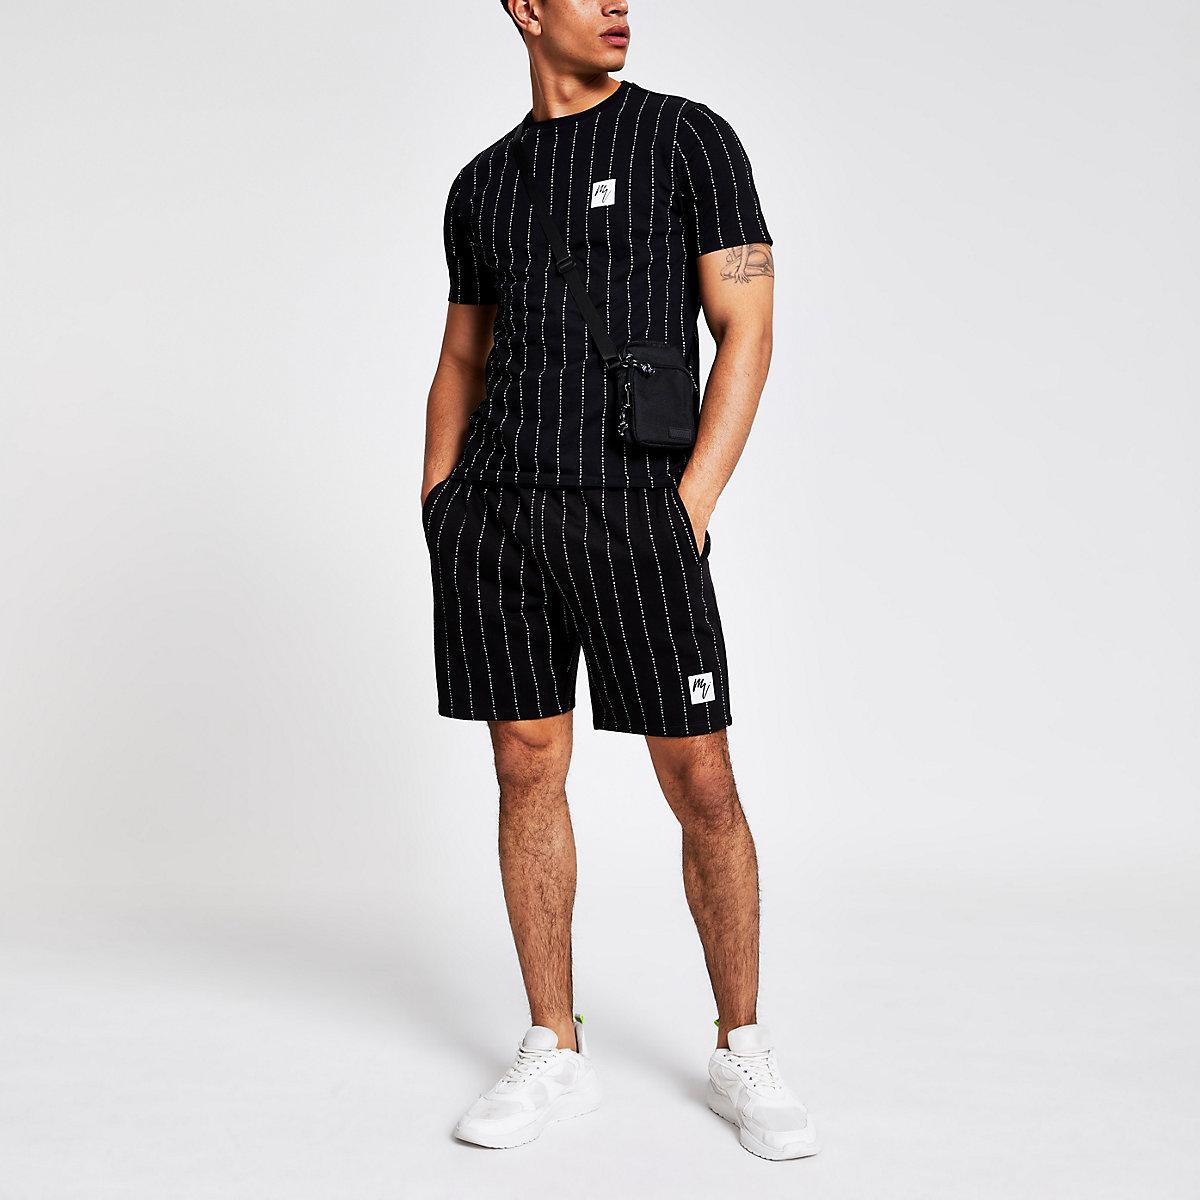 37977d03626ada River Island maison riviera stripe slim fit t-shirt at £15